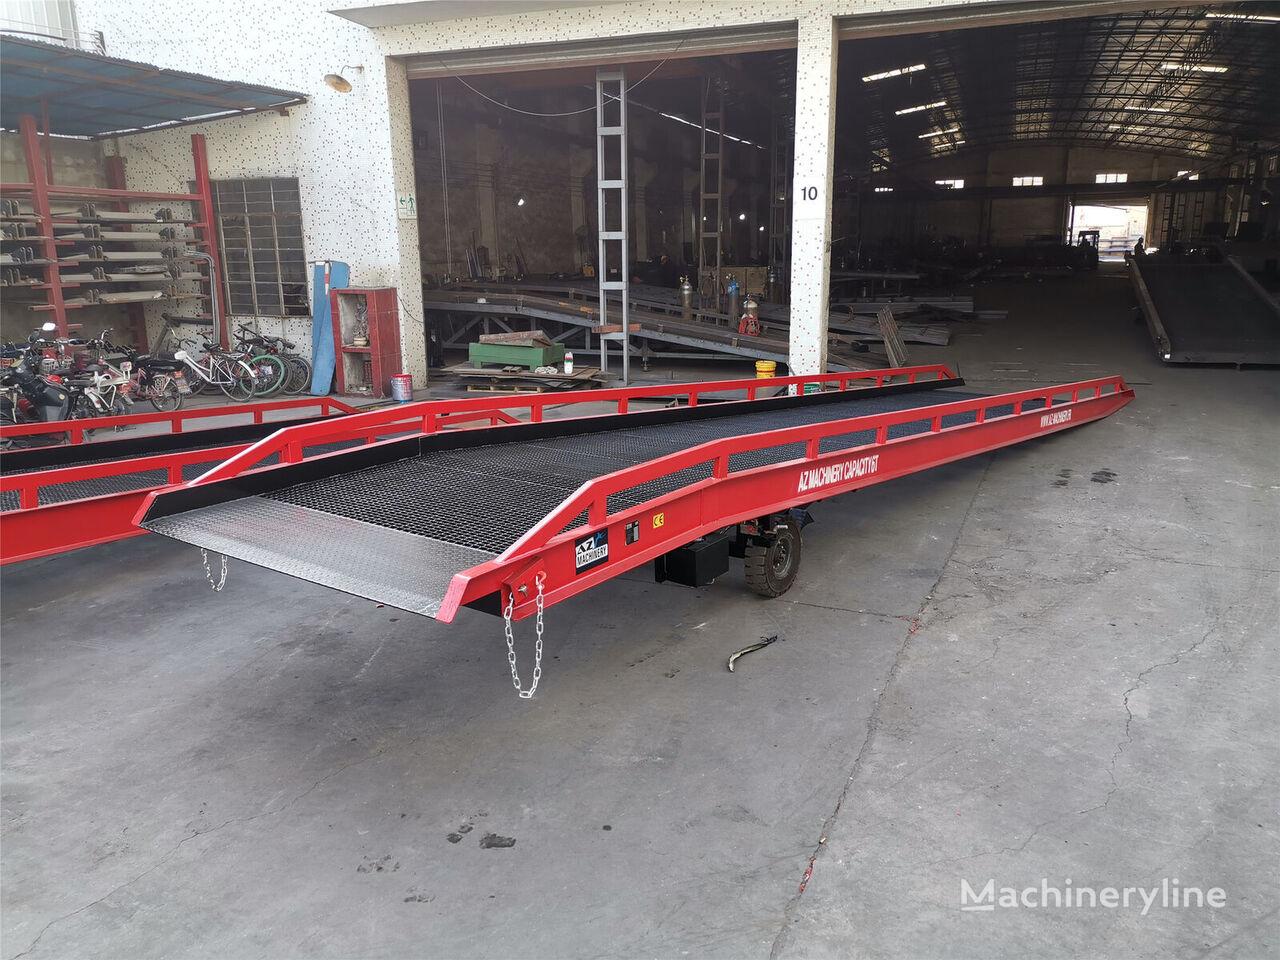 new AZ-MACHINERY AZ RAMP -EASY XL 6 loading dock ramp